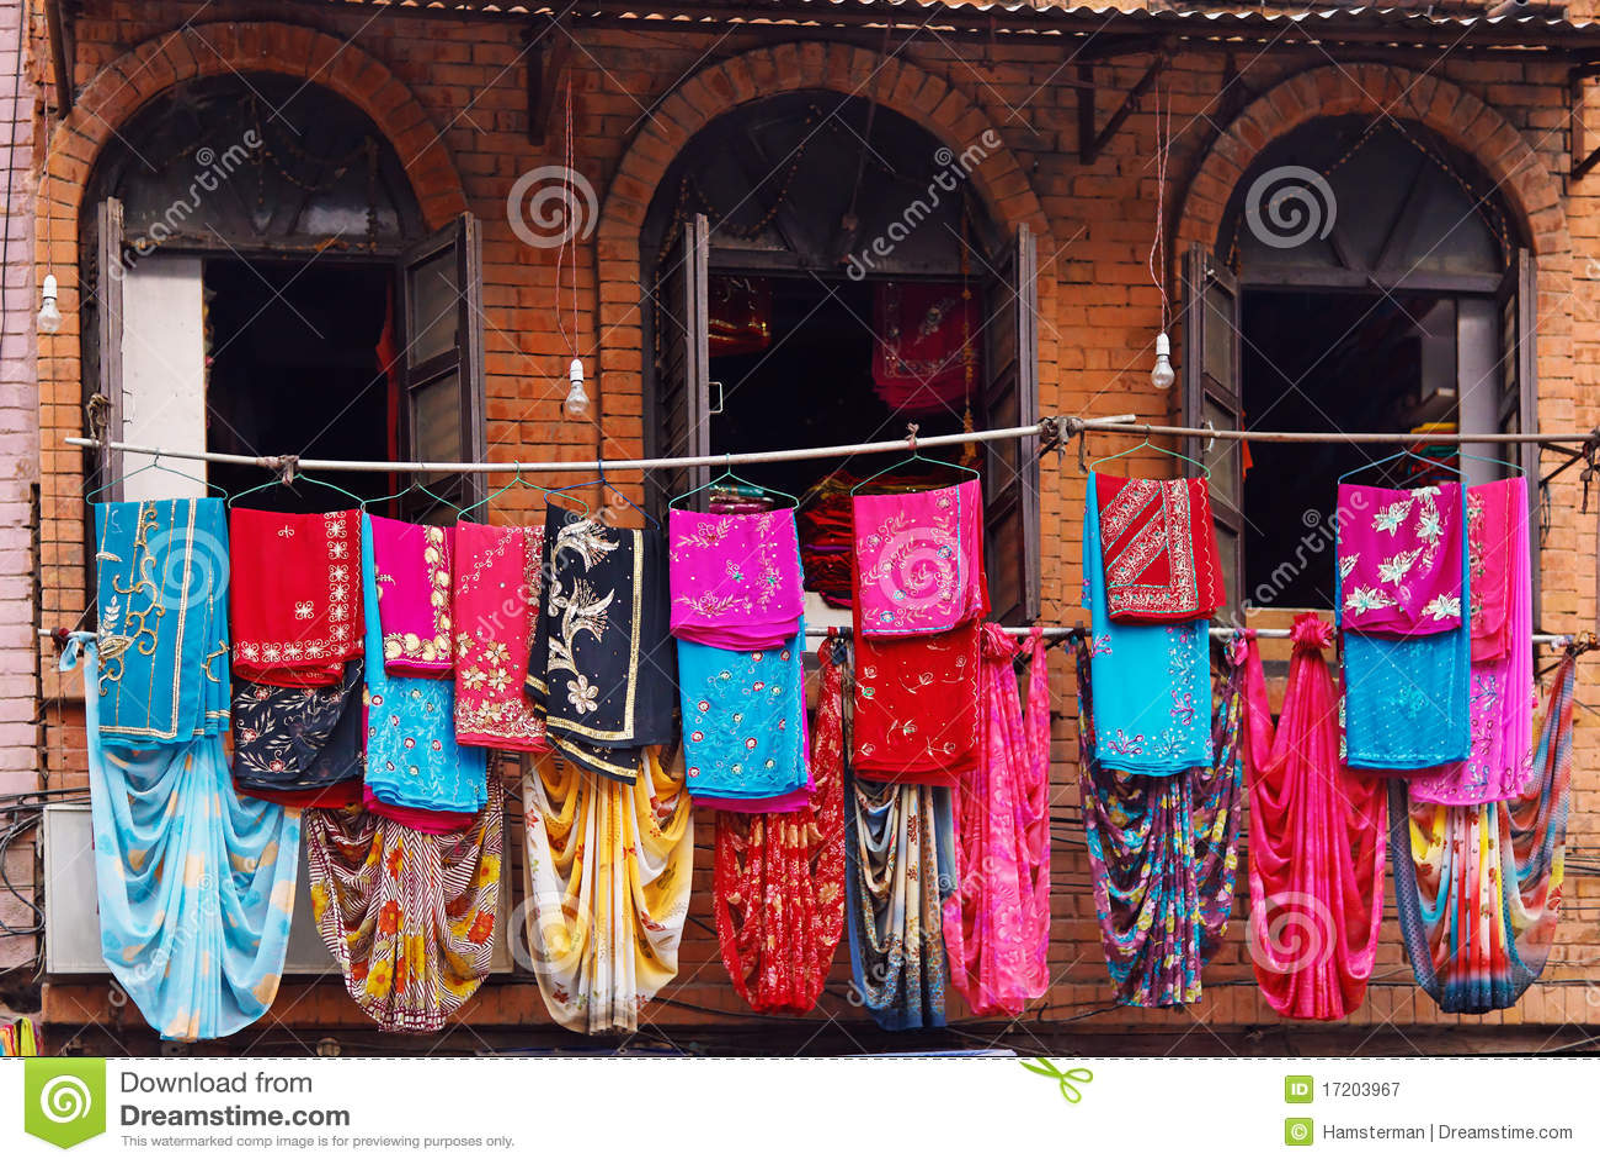 Nepal clothing store